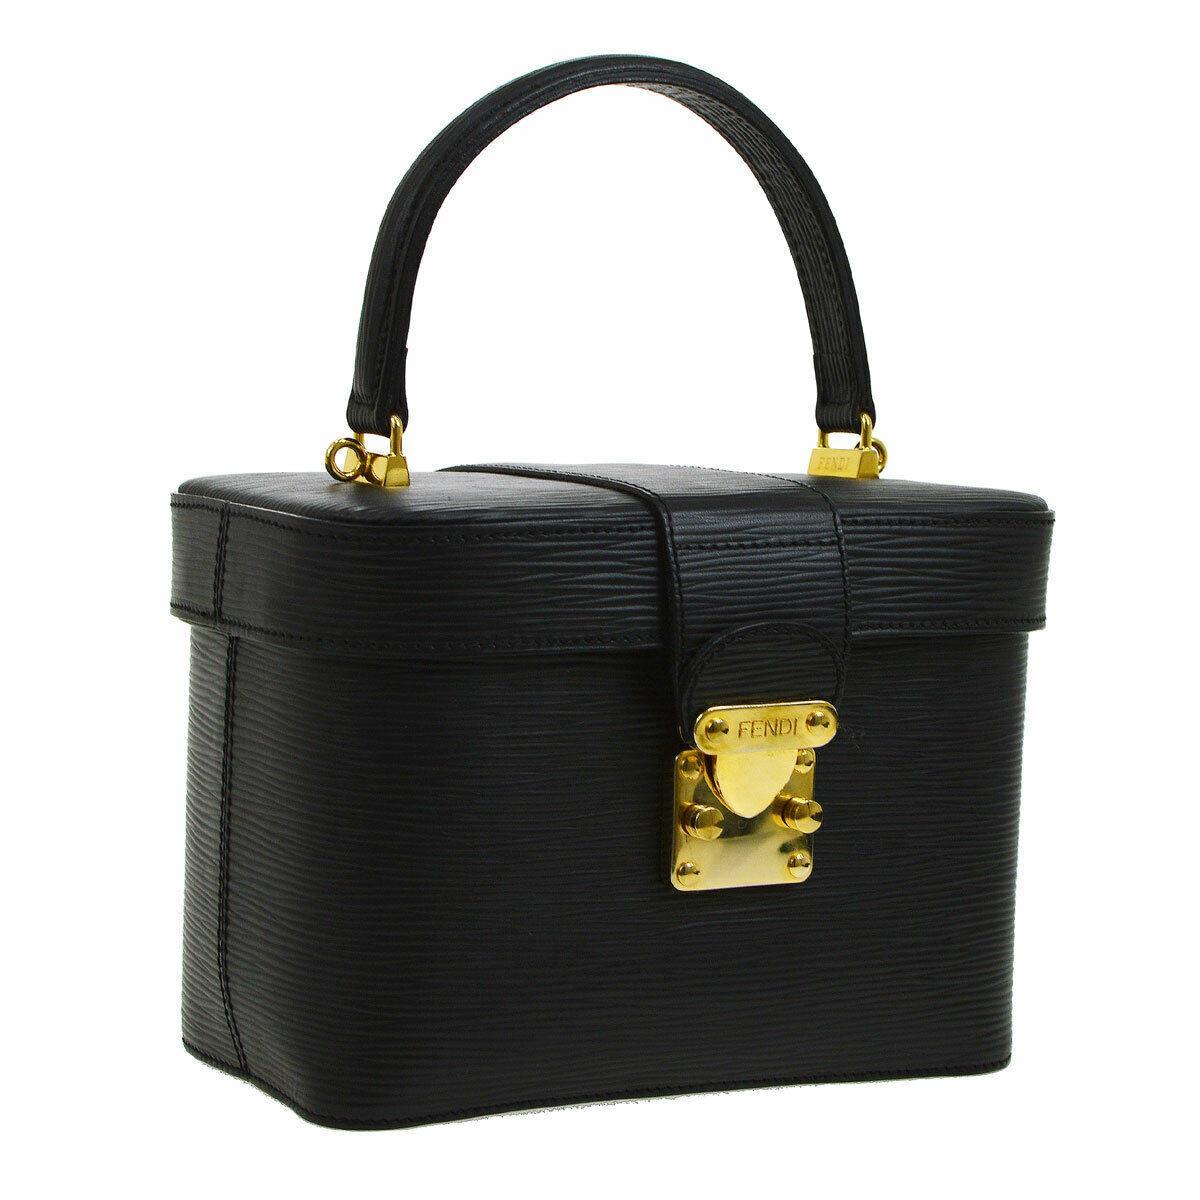 Fendi Black Leather Box Vanity 2 in 1 Evening Top Handle Satchel Shoulder Bag